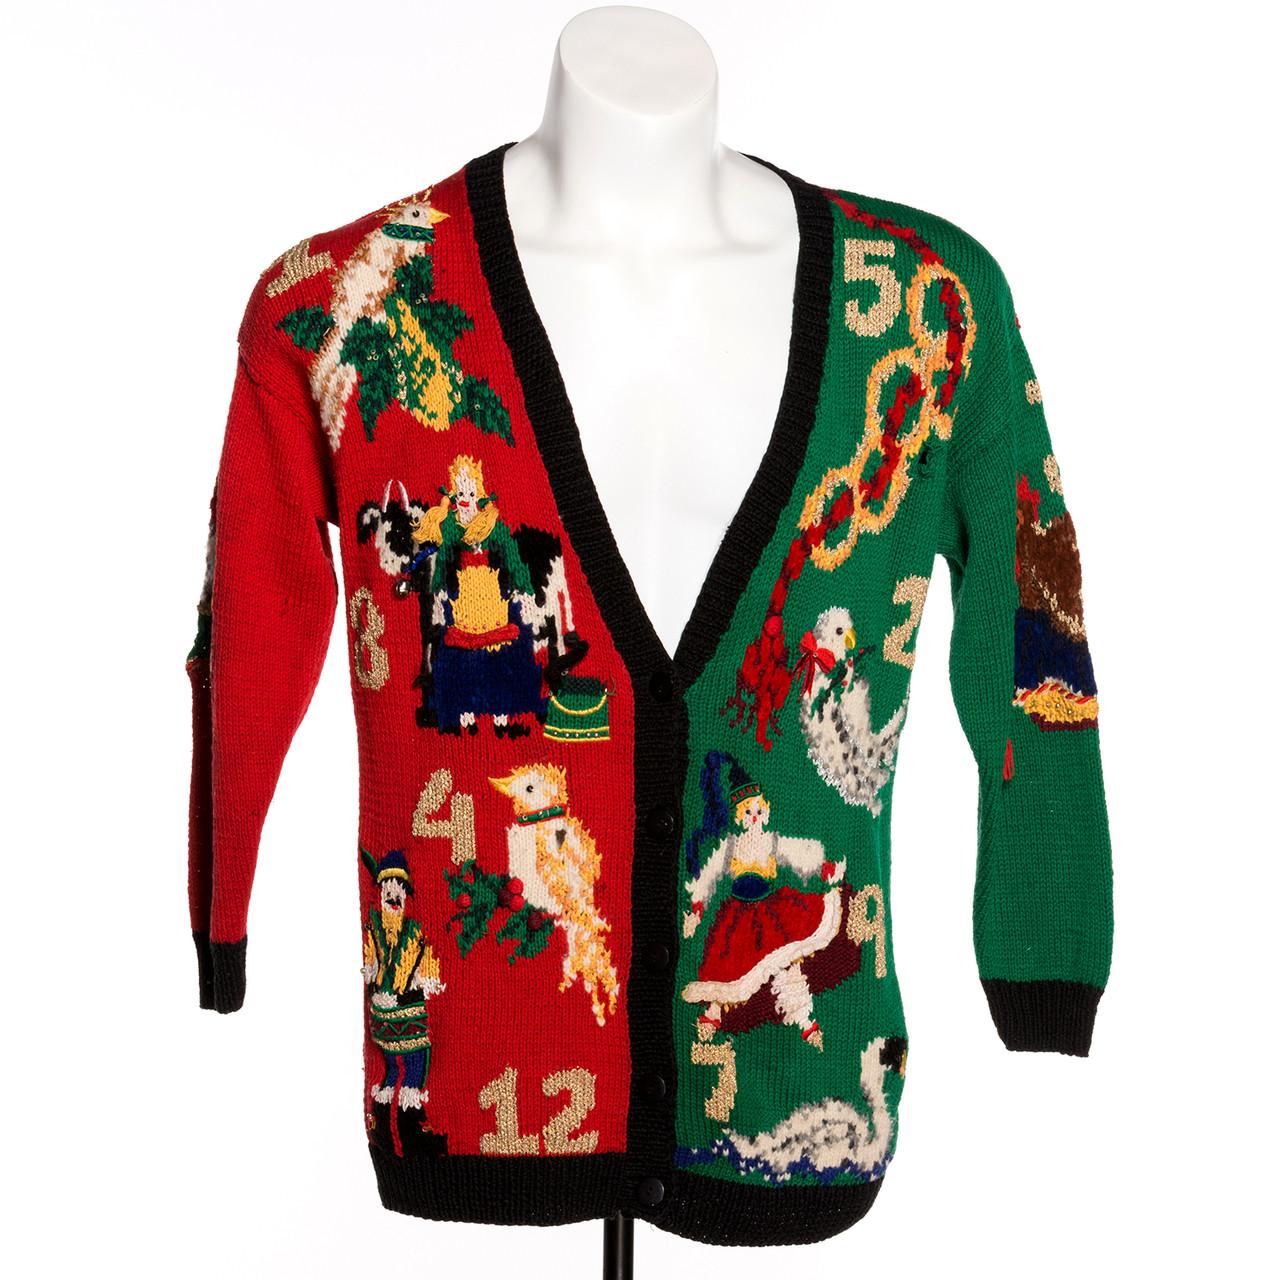 Twelve Days Of Christmas Vintage Ugly Sweater Retrofestiveca